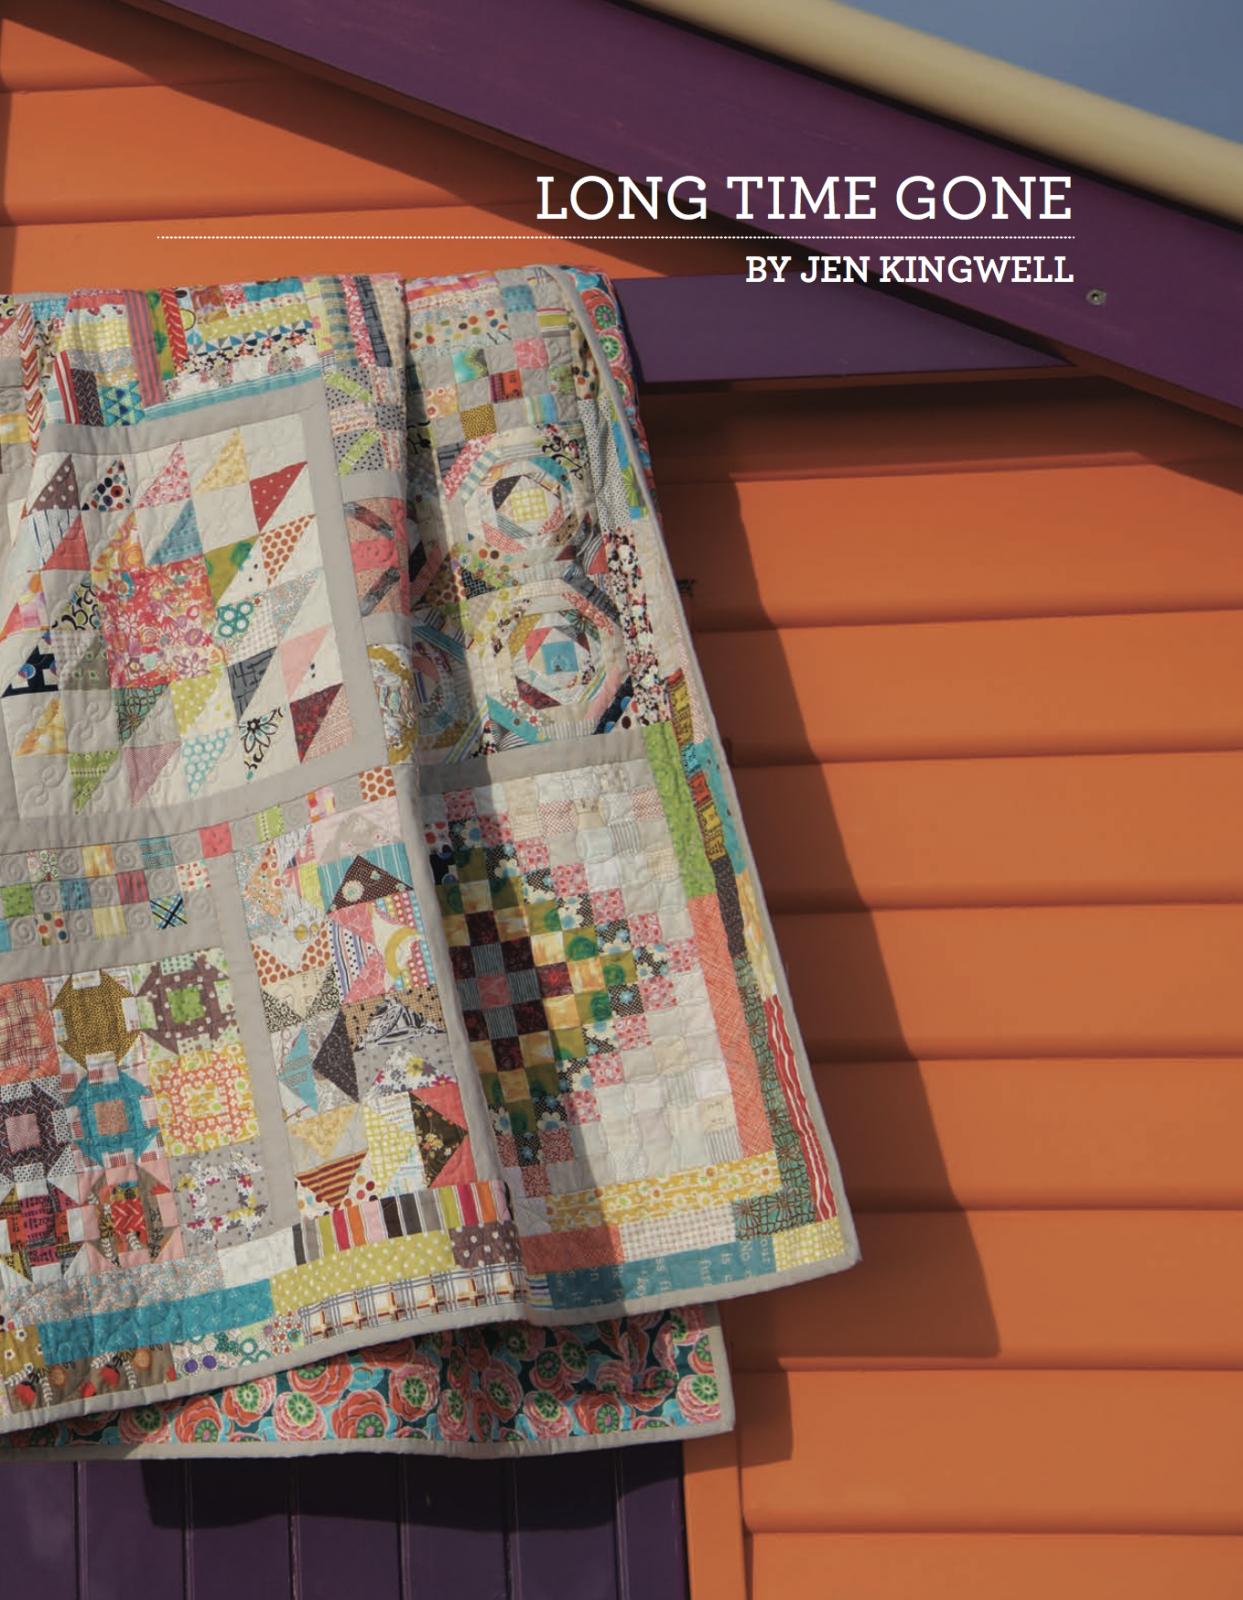 Long Time Gone Booklet by Jen Kingwell Designs